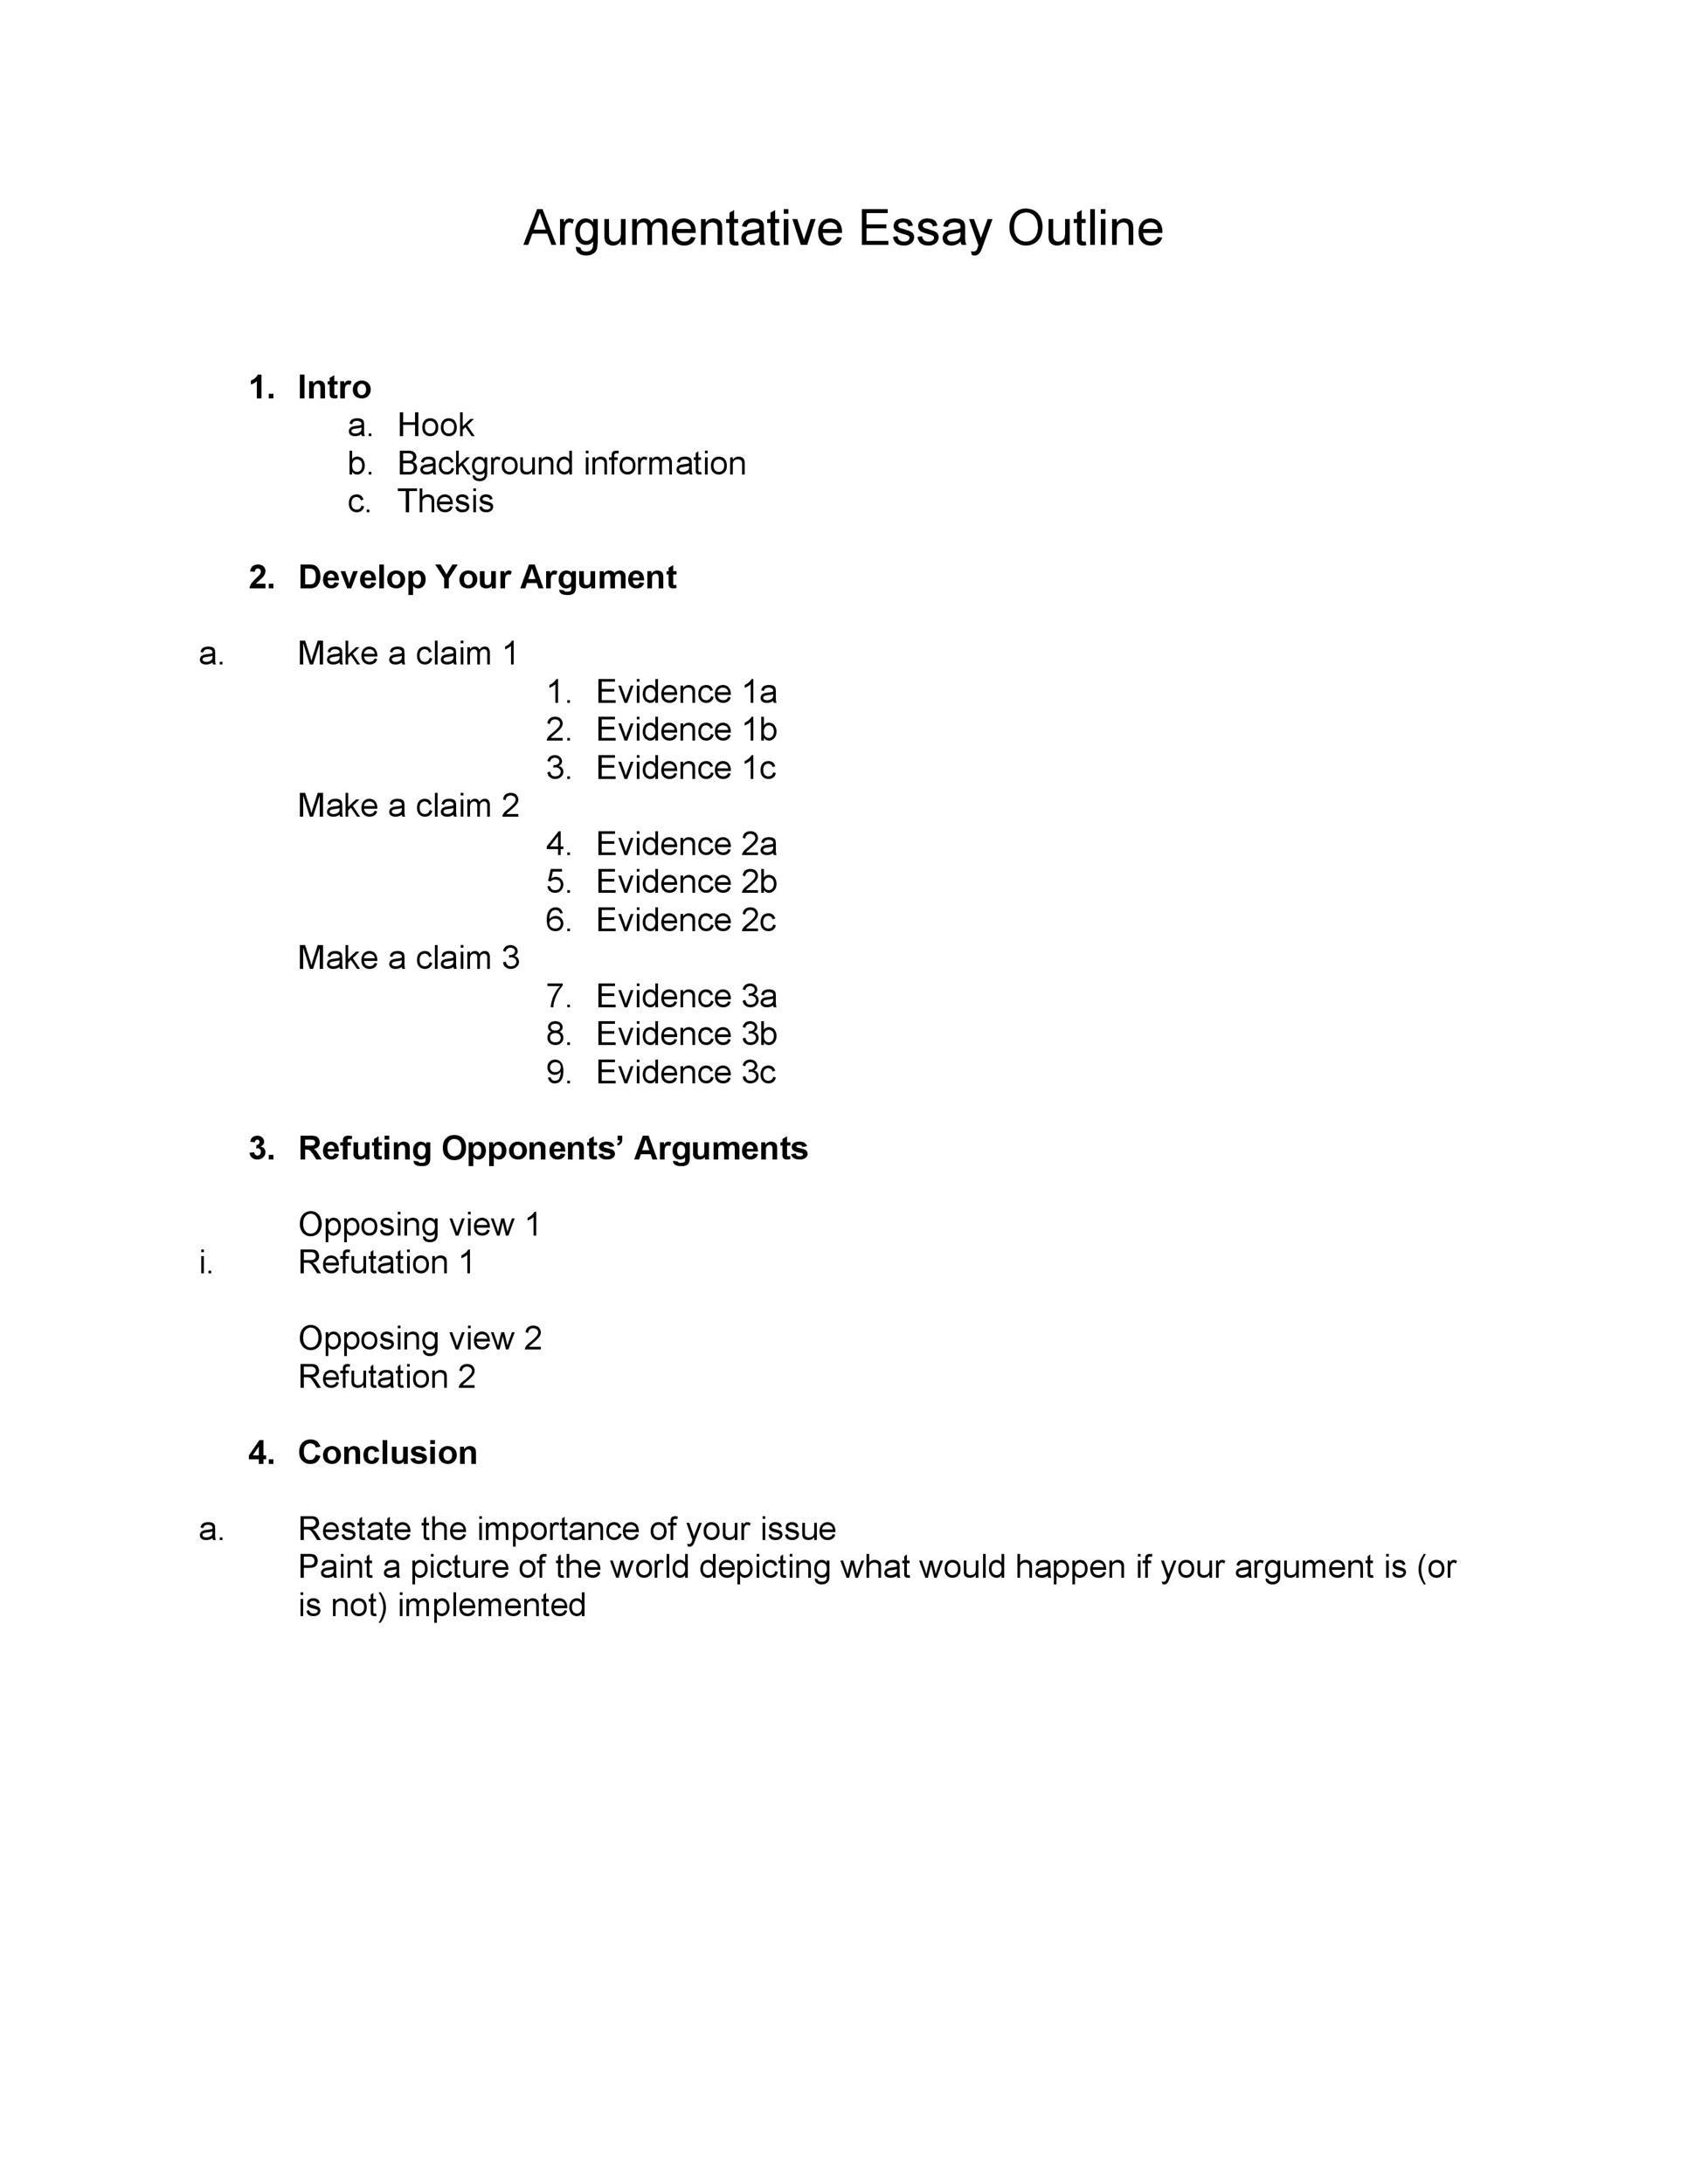 37 Outstanding Essay Outline Templates Argumentative